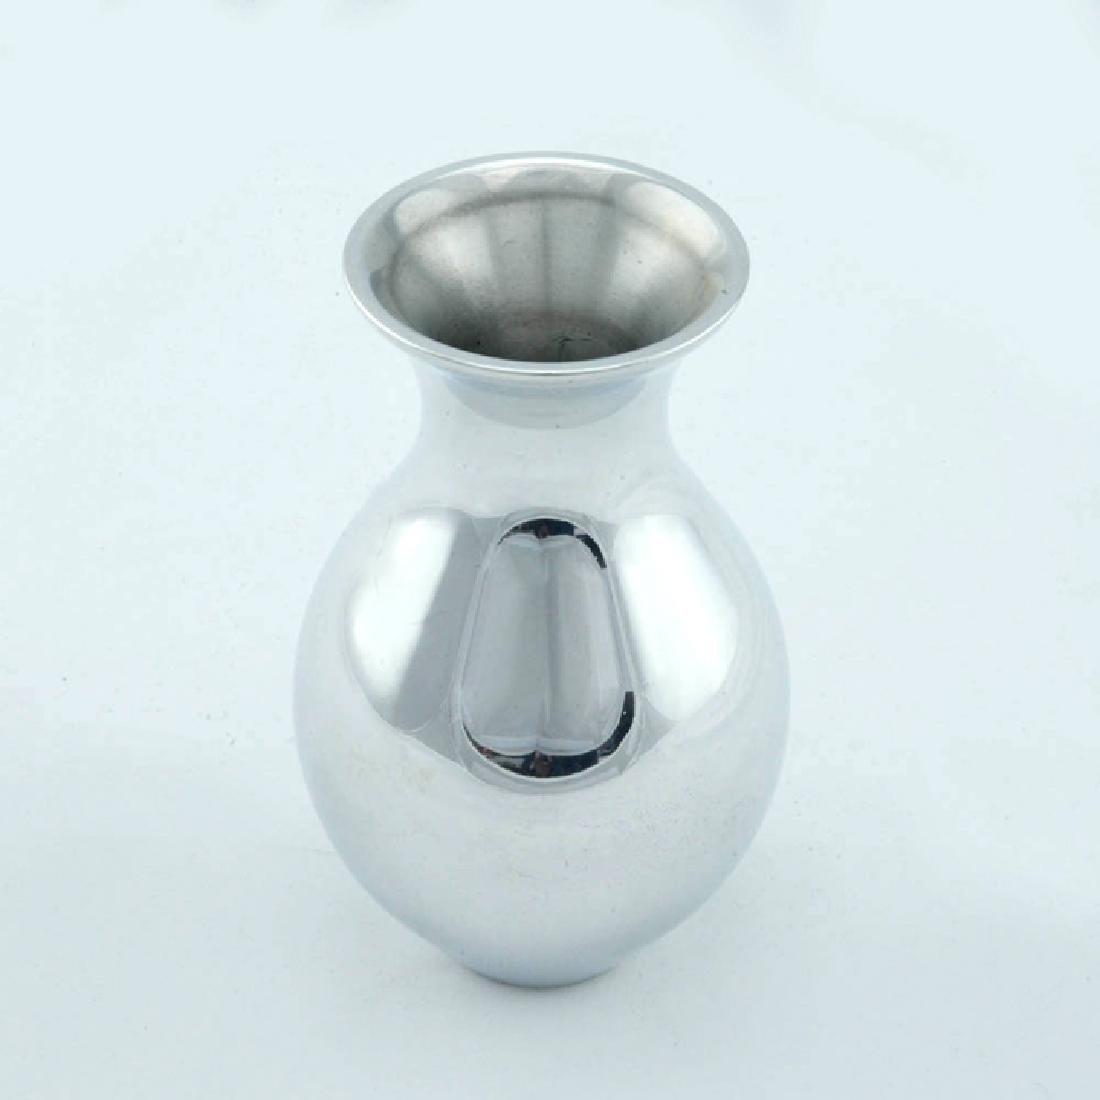 Set of 3 Zeisel Nambe Bud Vases - 2